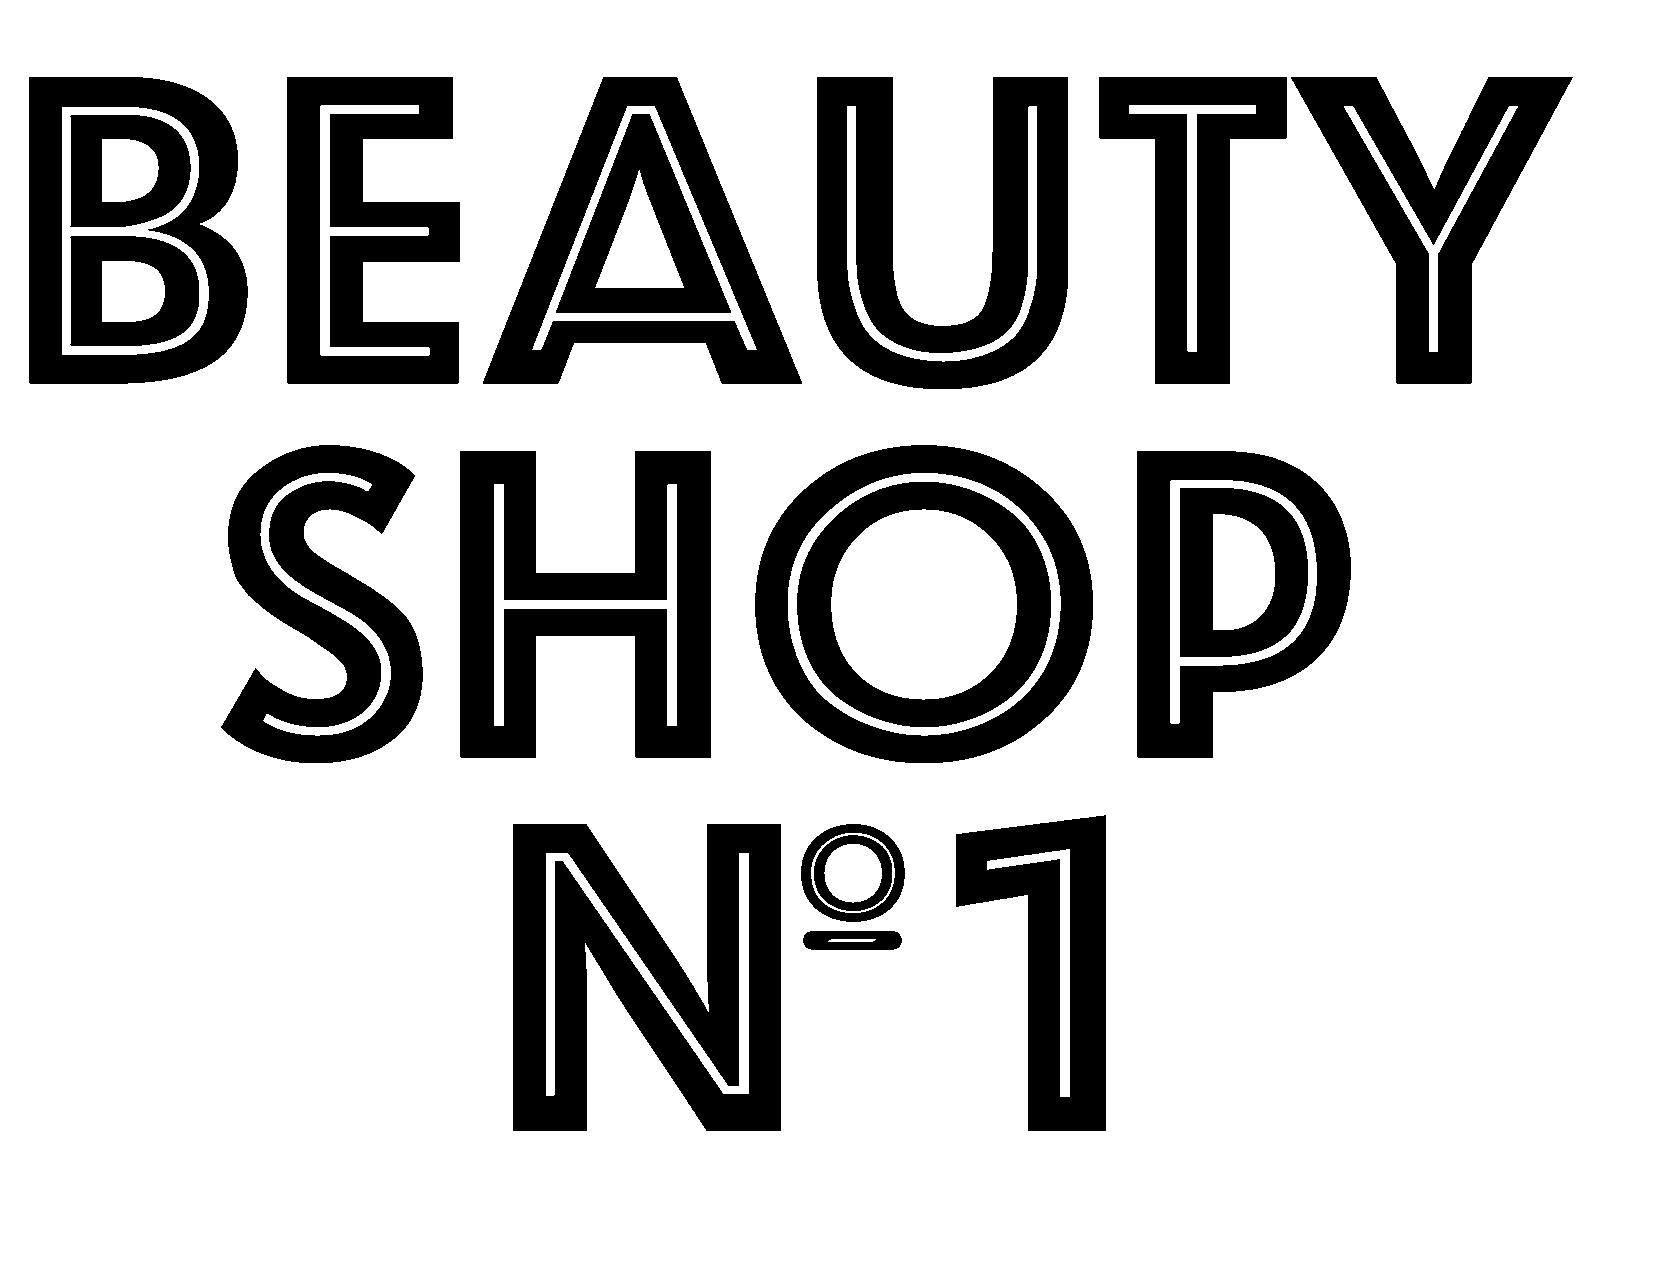 Ed and Beauty SHOP